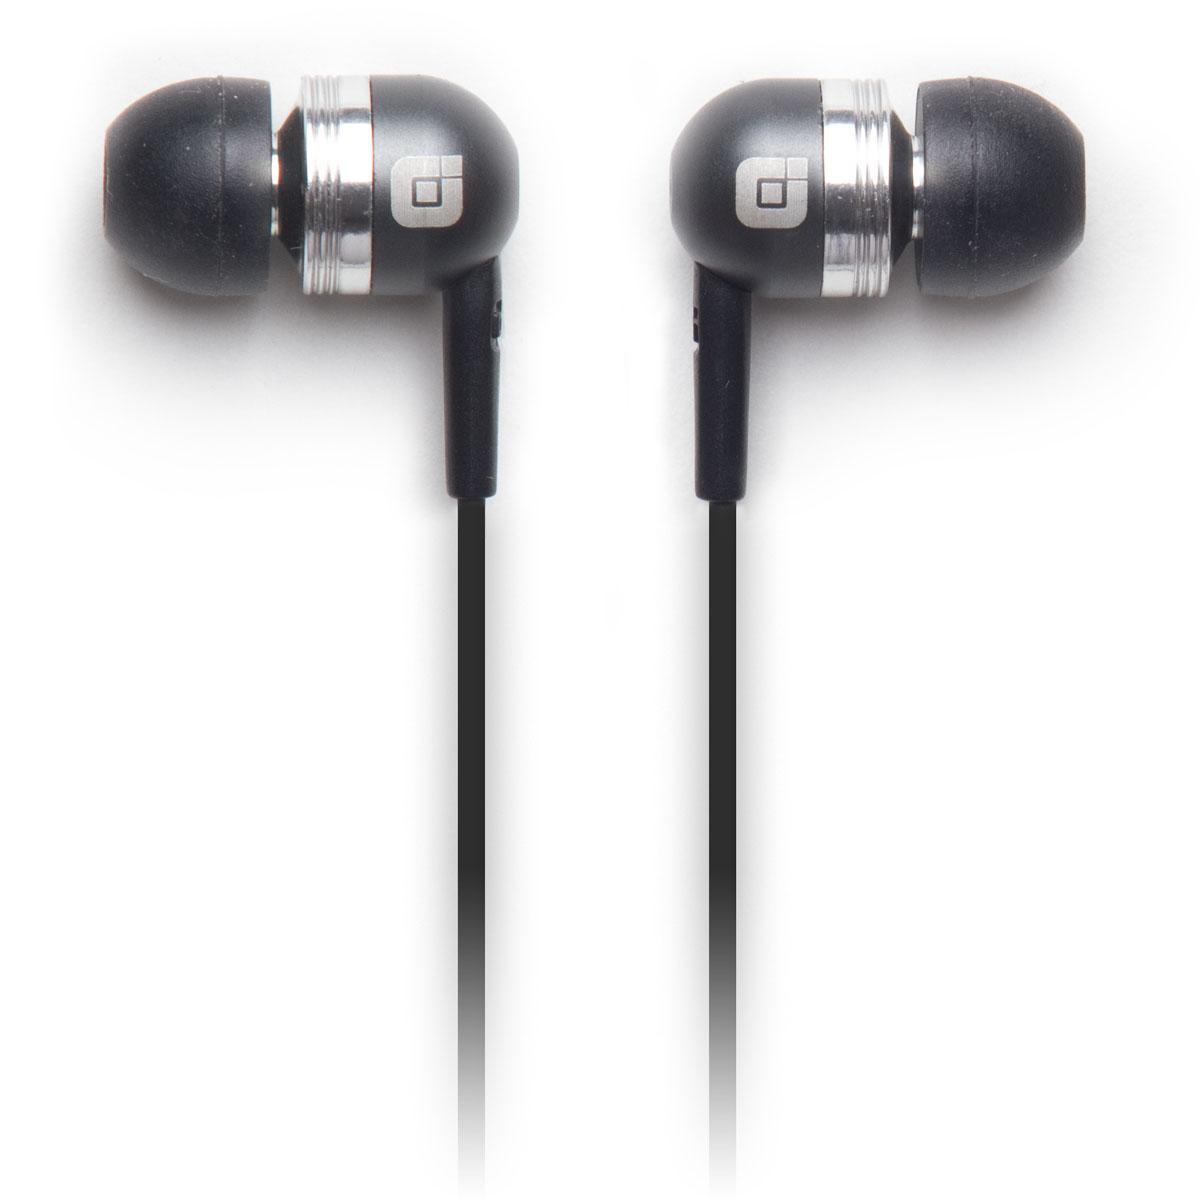 Earjax Bump Gun Metal Grey Earbuds with In line Mic